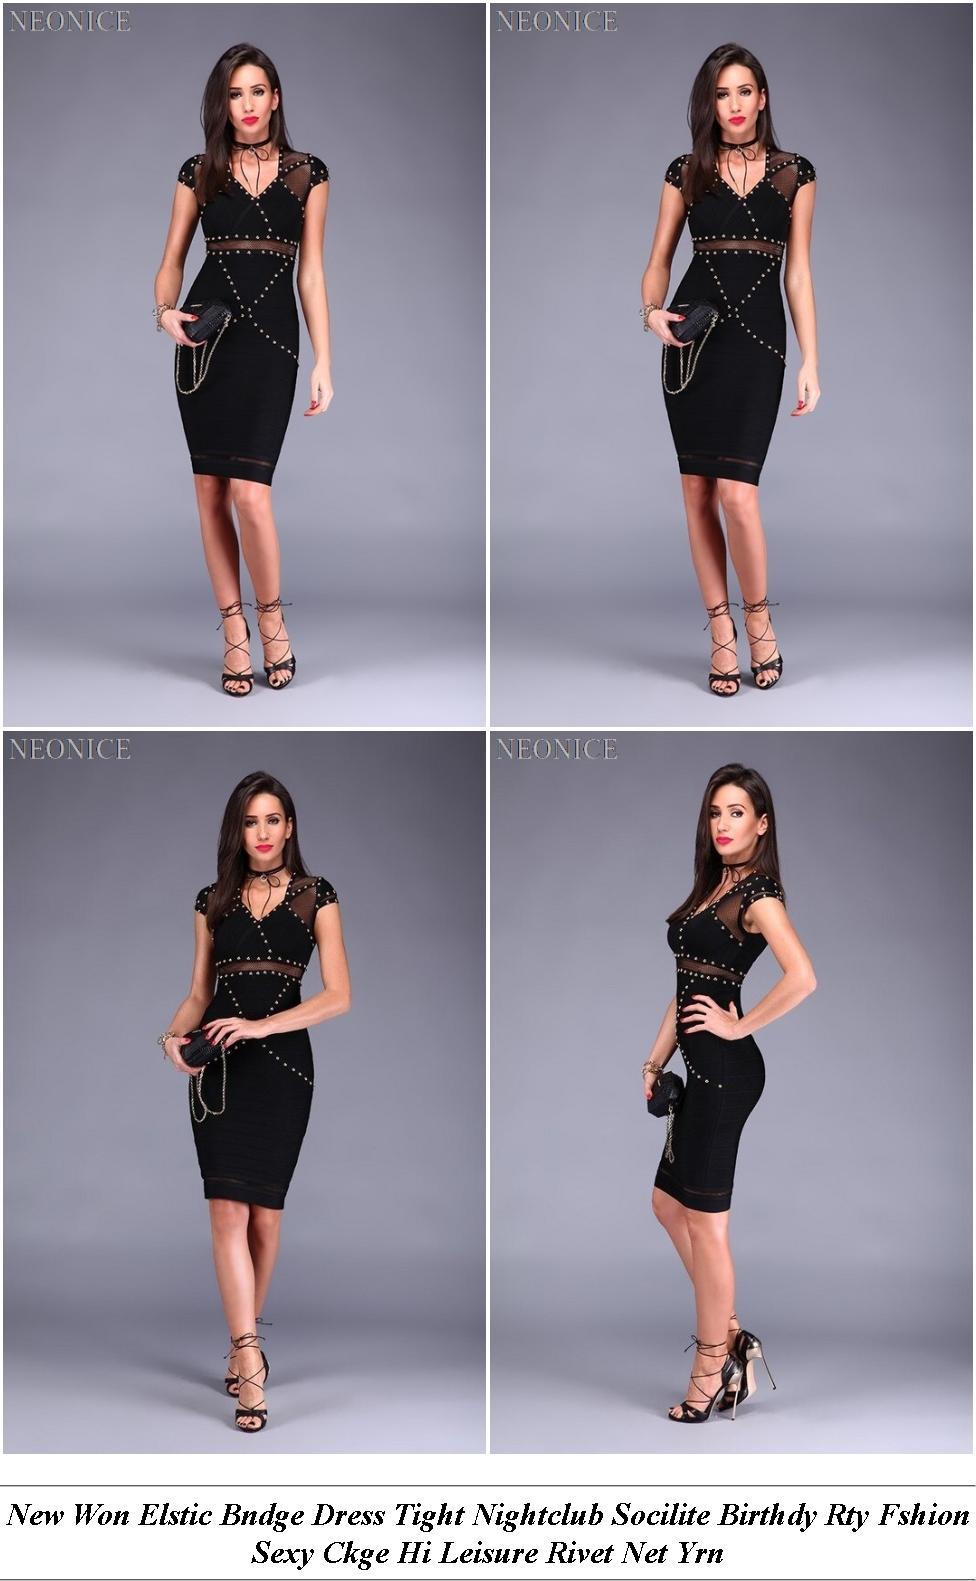 Dresses For Women - Store For Sale - Purple Dress - Cheap Clothes Online Uk